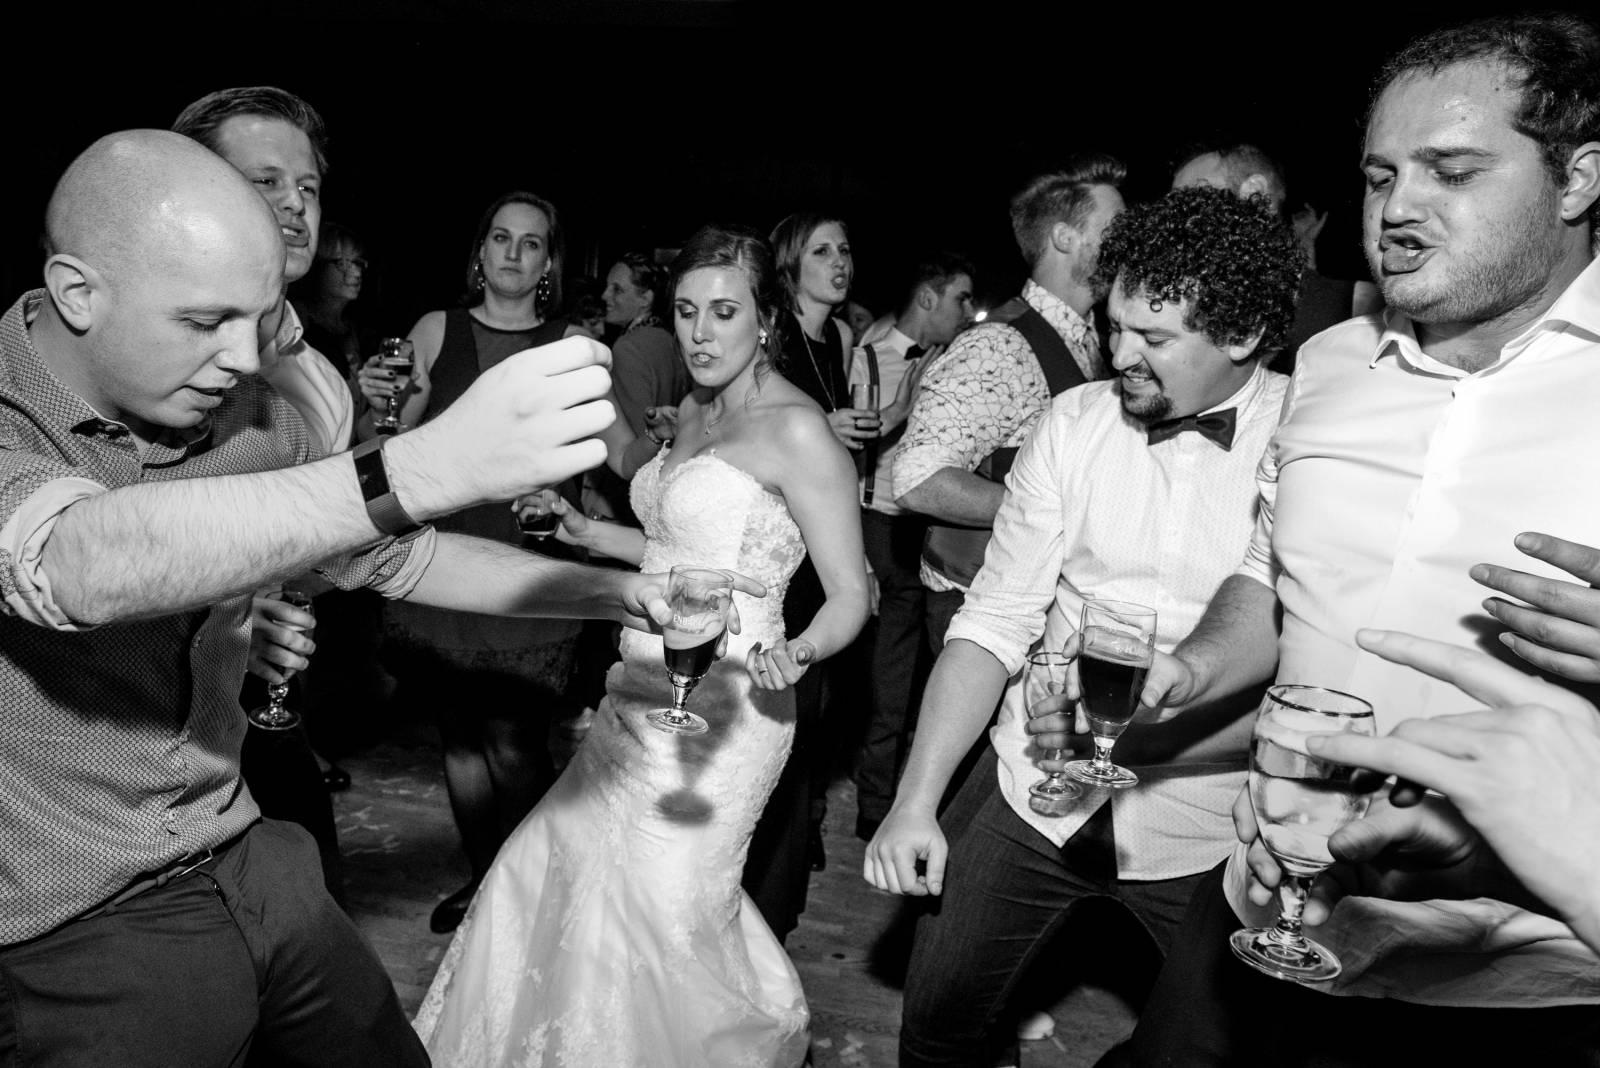 Fotografie Melody - Huwelijksfotograaf - Trouwfotograaf - House of Weddings - 18